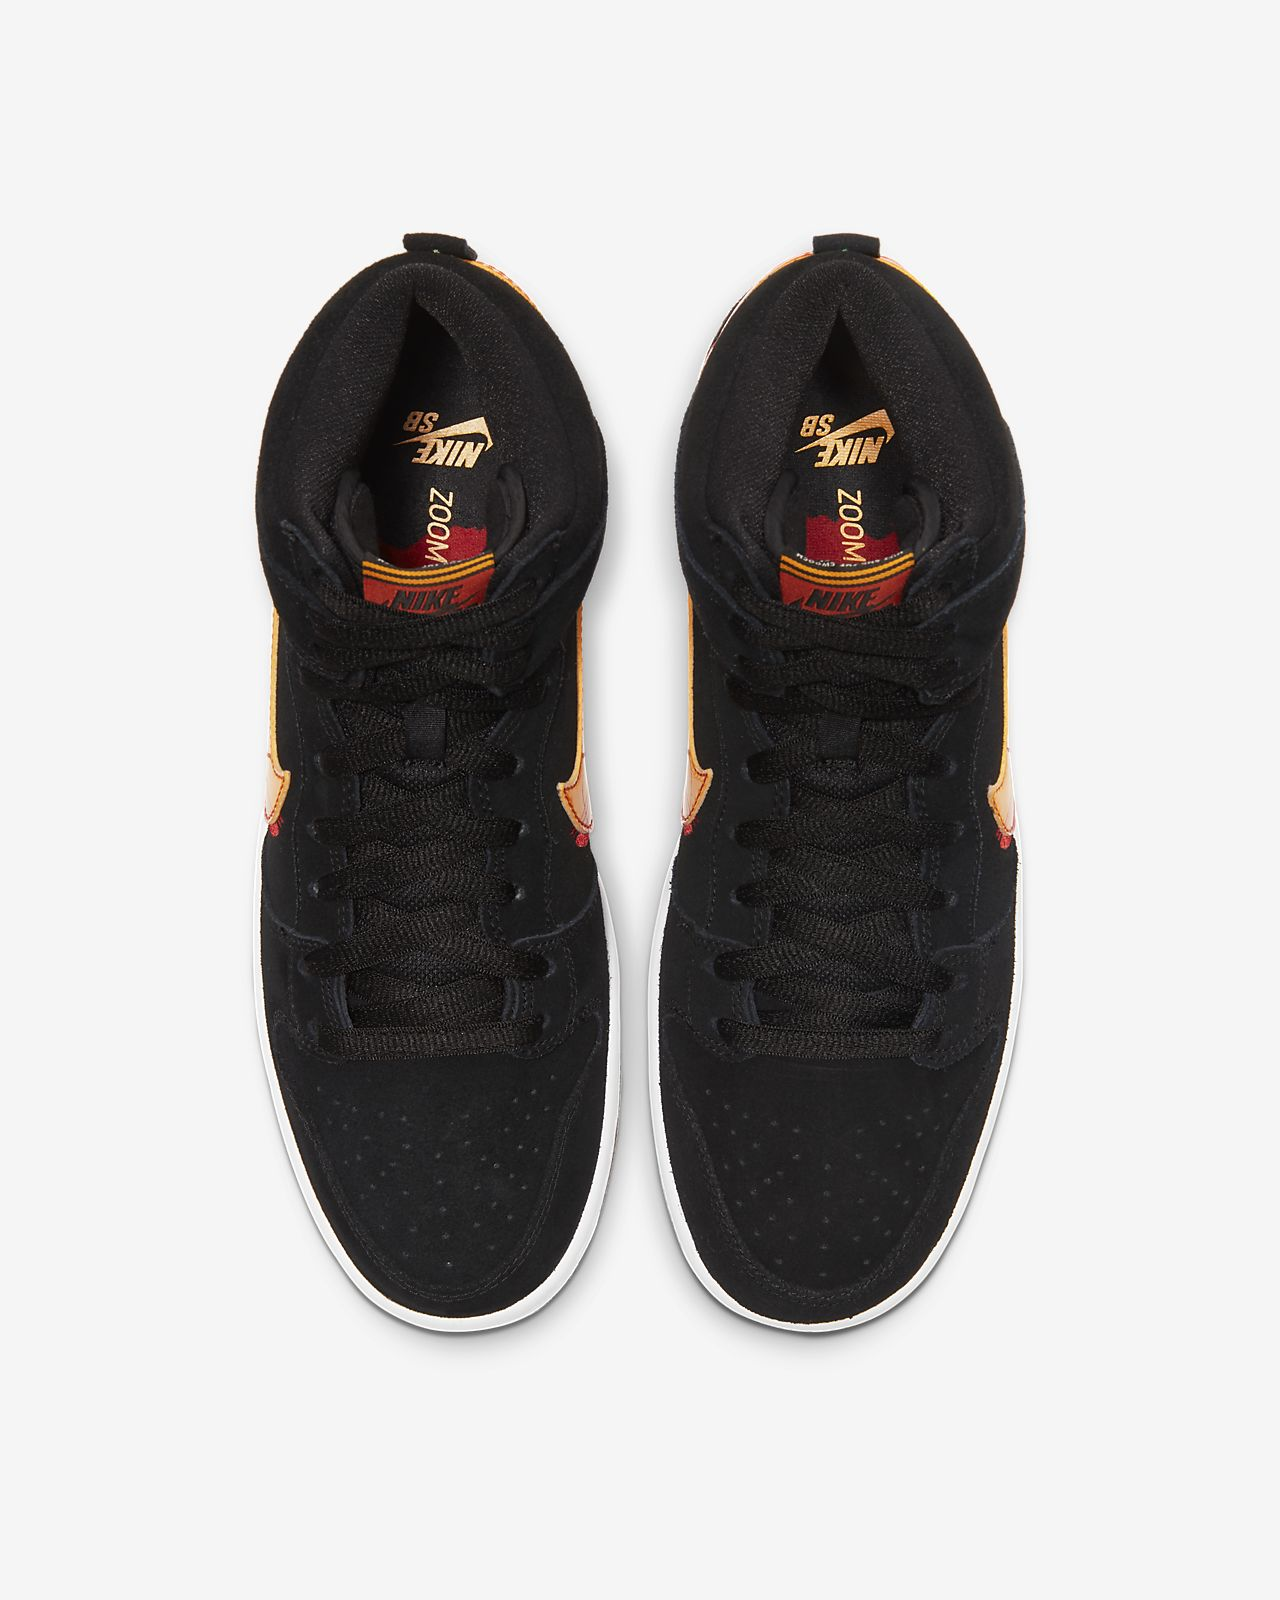 Nike SB Dunk Hi Pro 305050 029 Black Gum Light Brown Mens